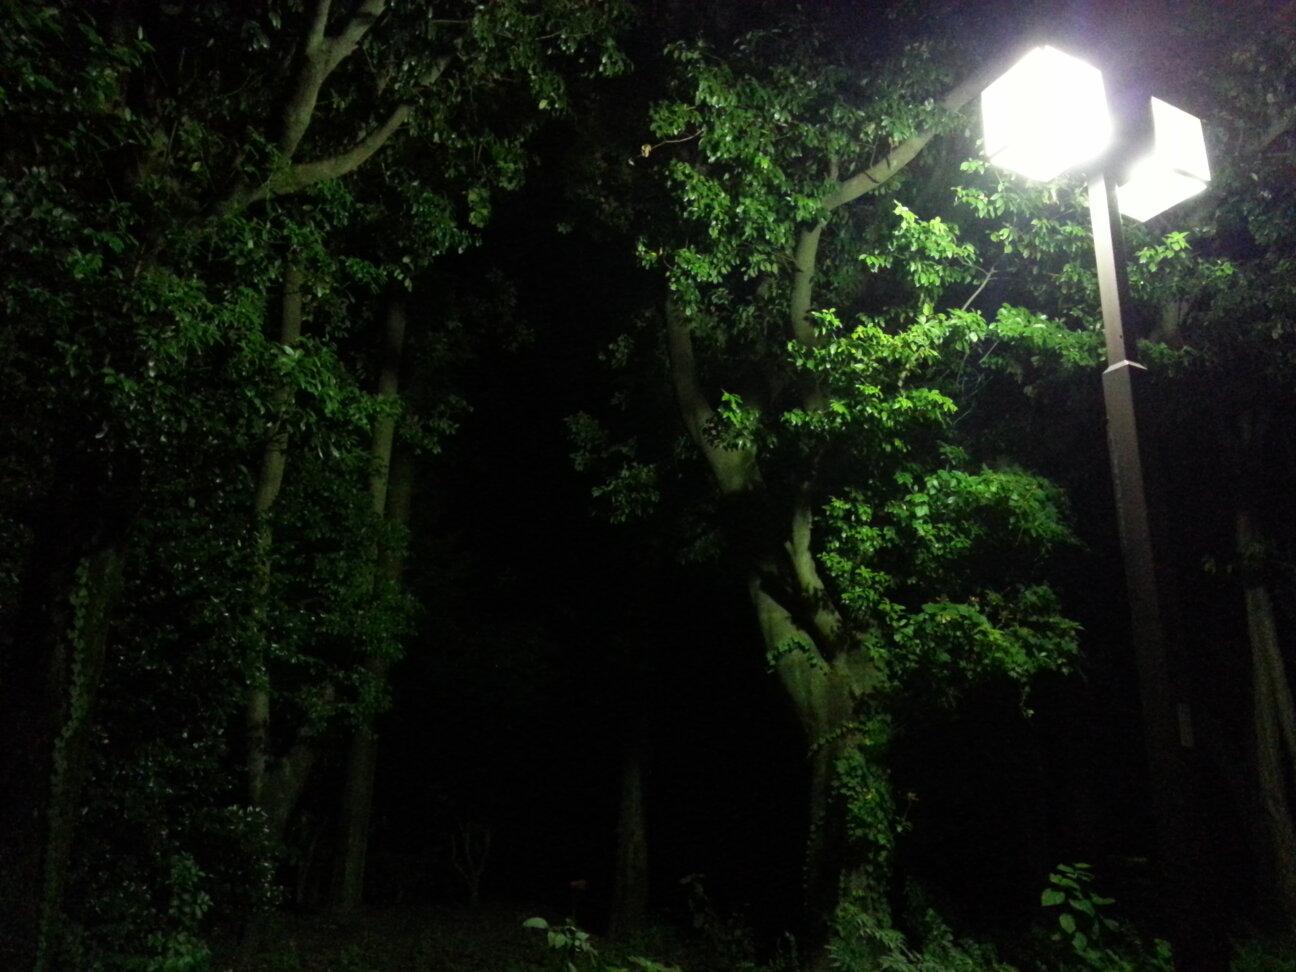 Galaxy S III αで撮った写真(夜の公園)